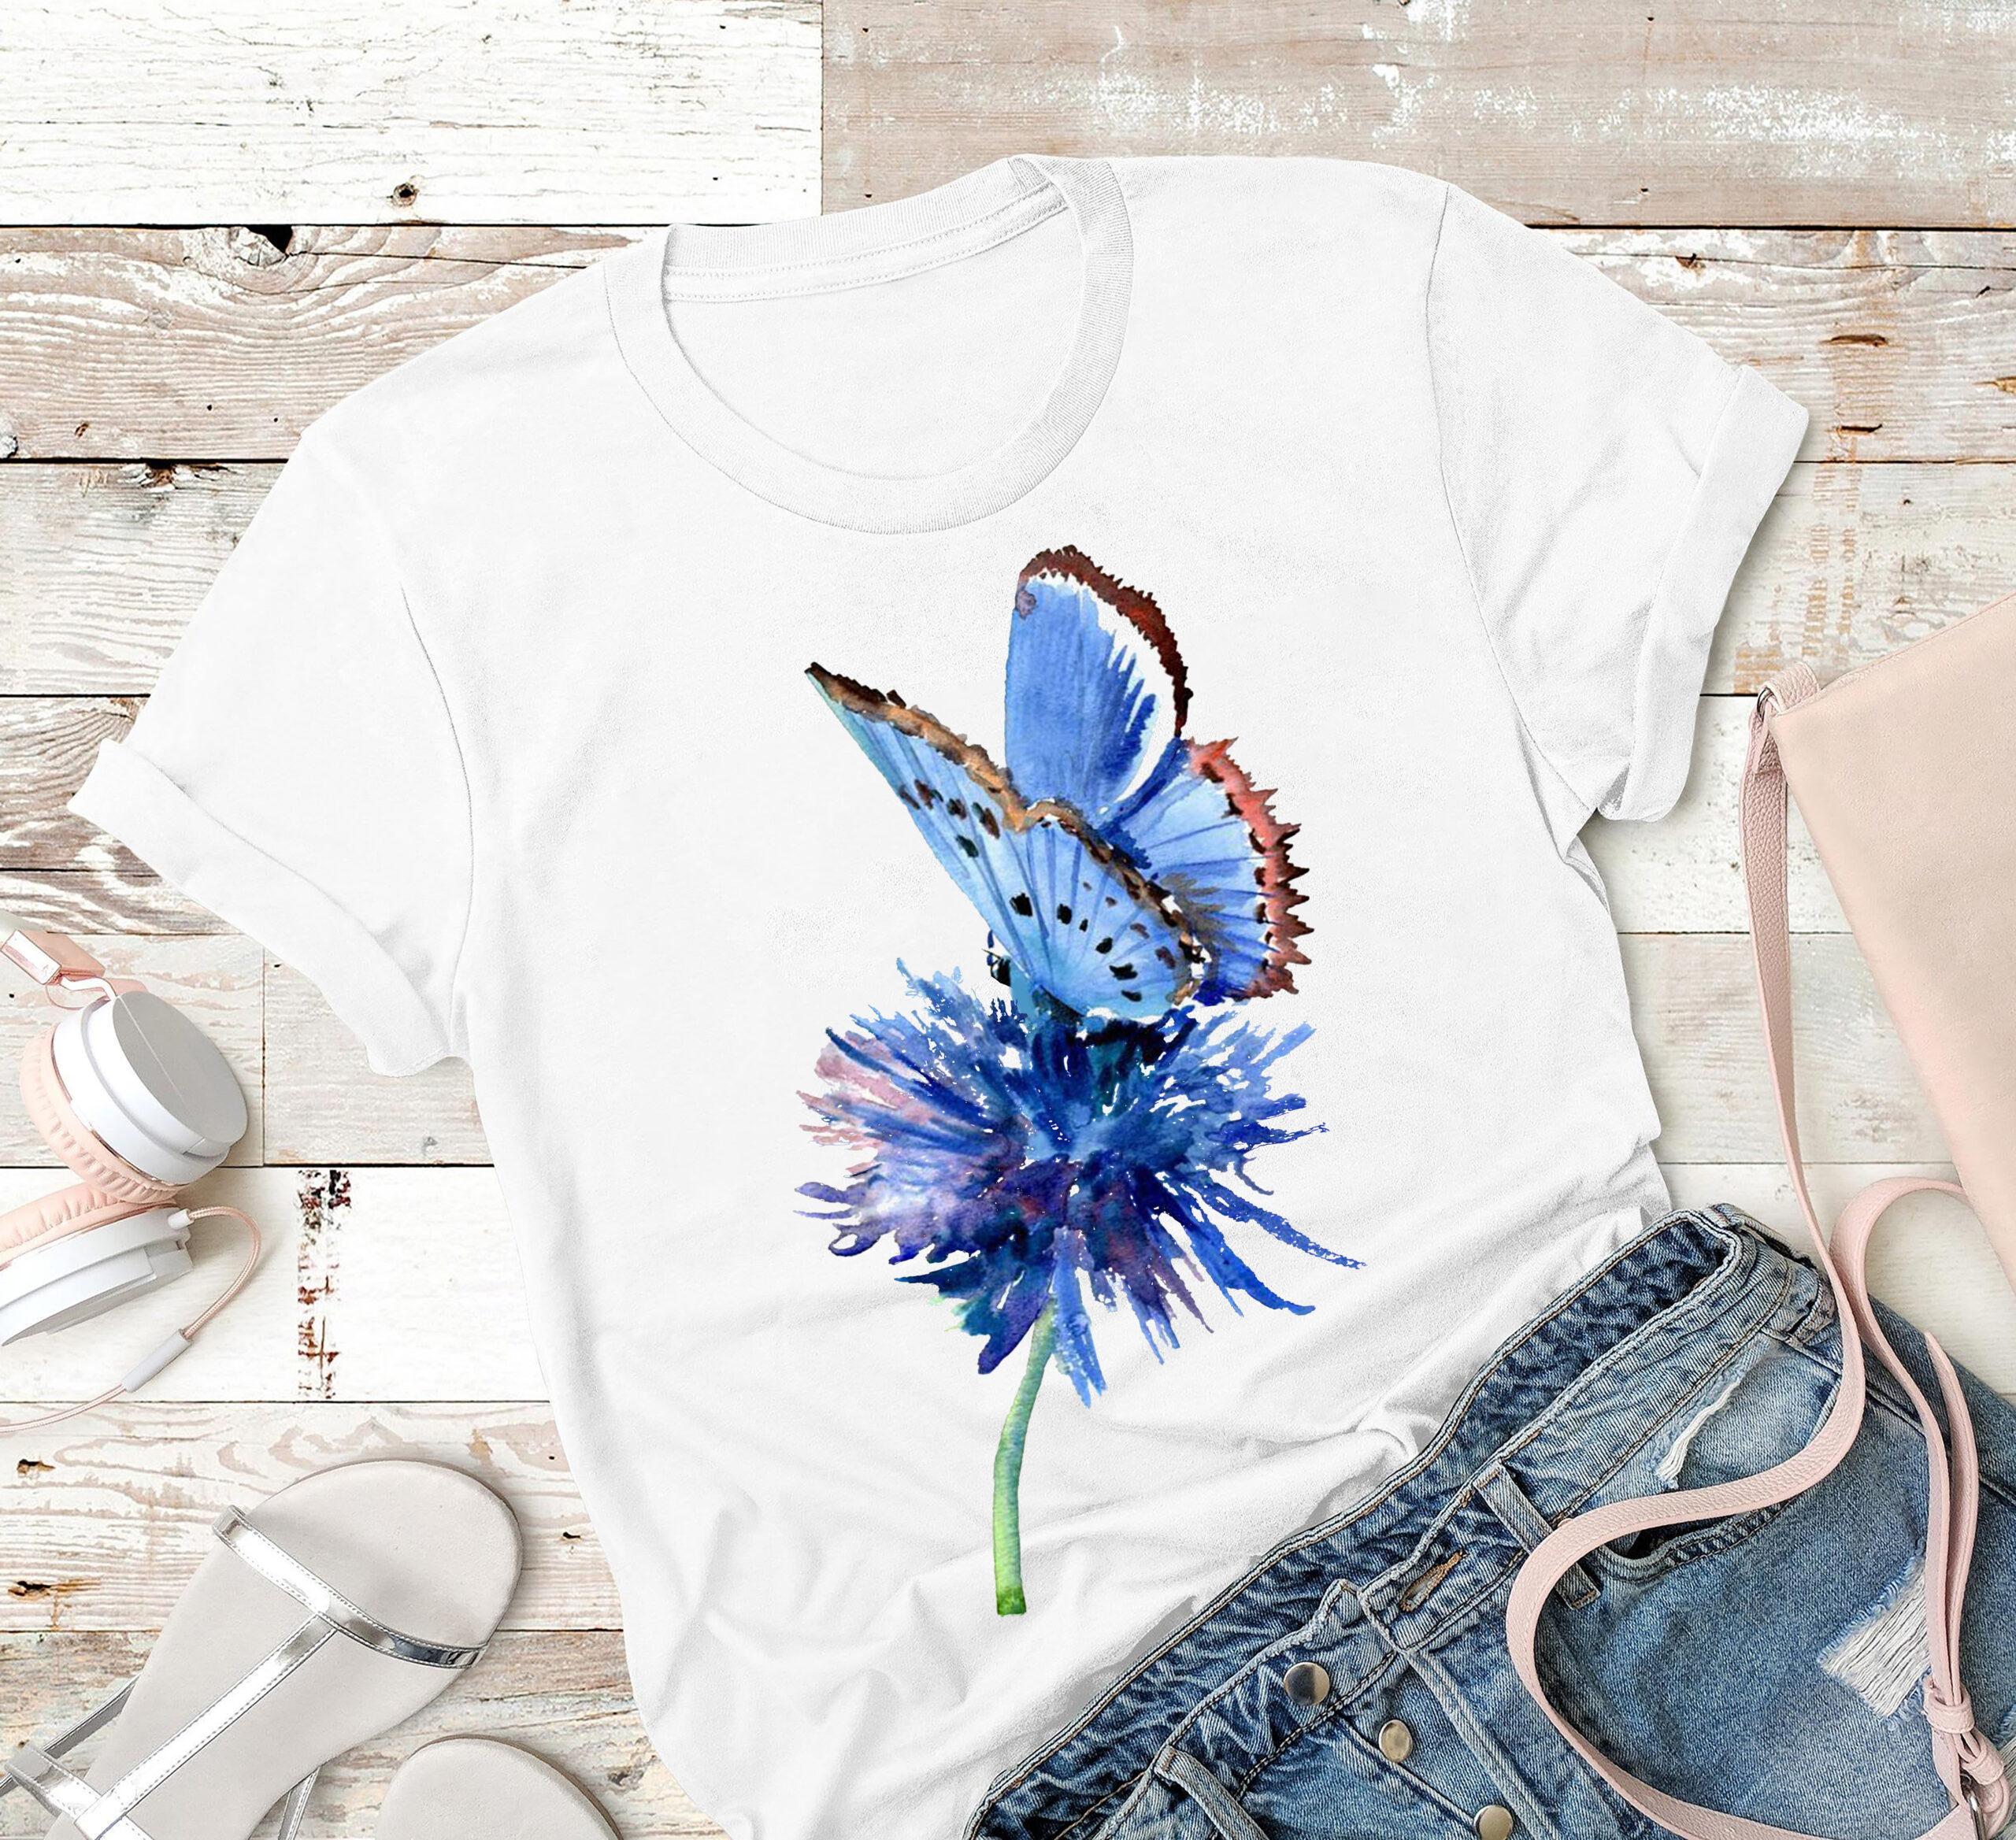 Garden Shirt Watercolor Blue Butterfly Painting